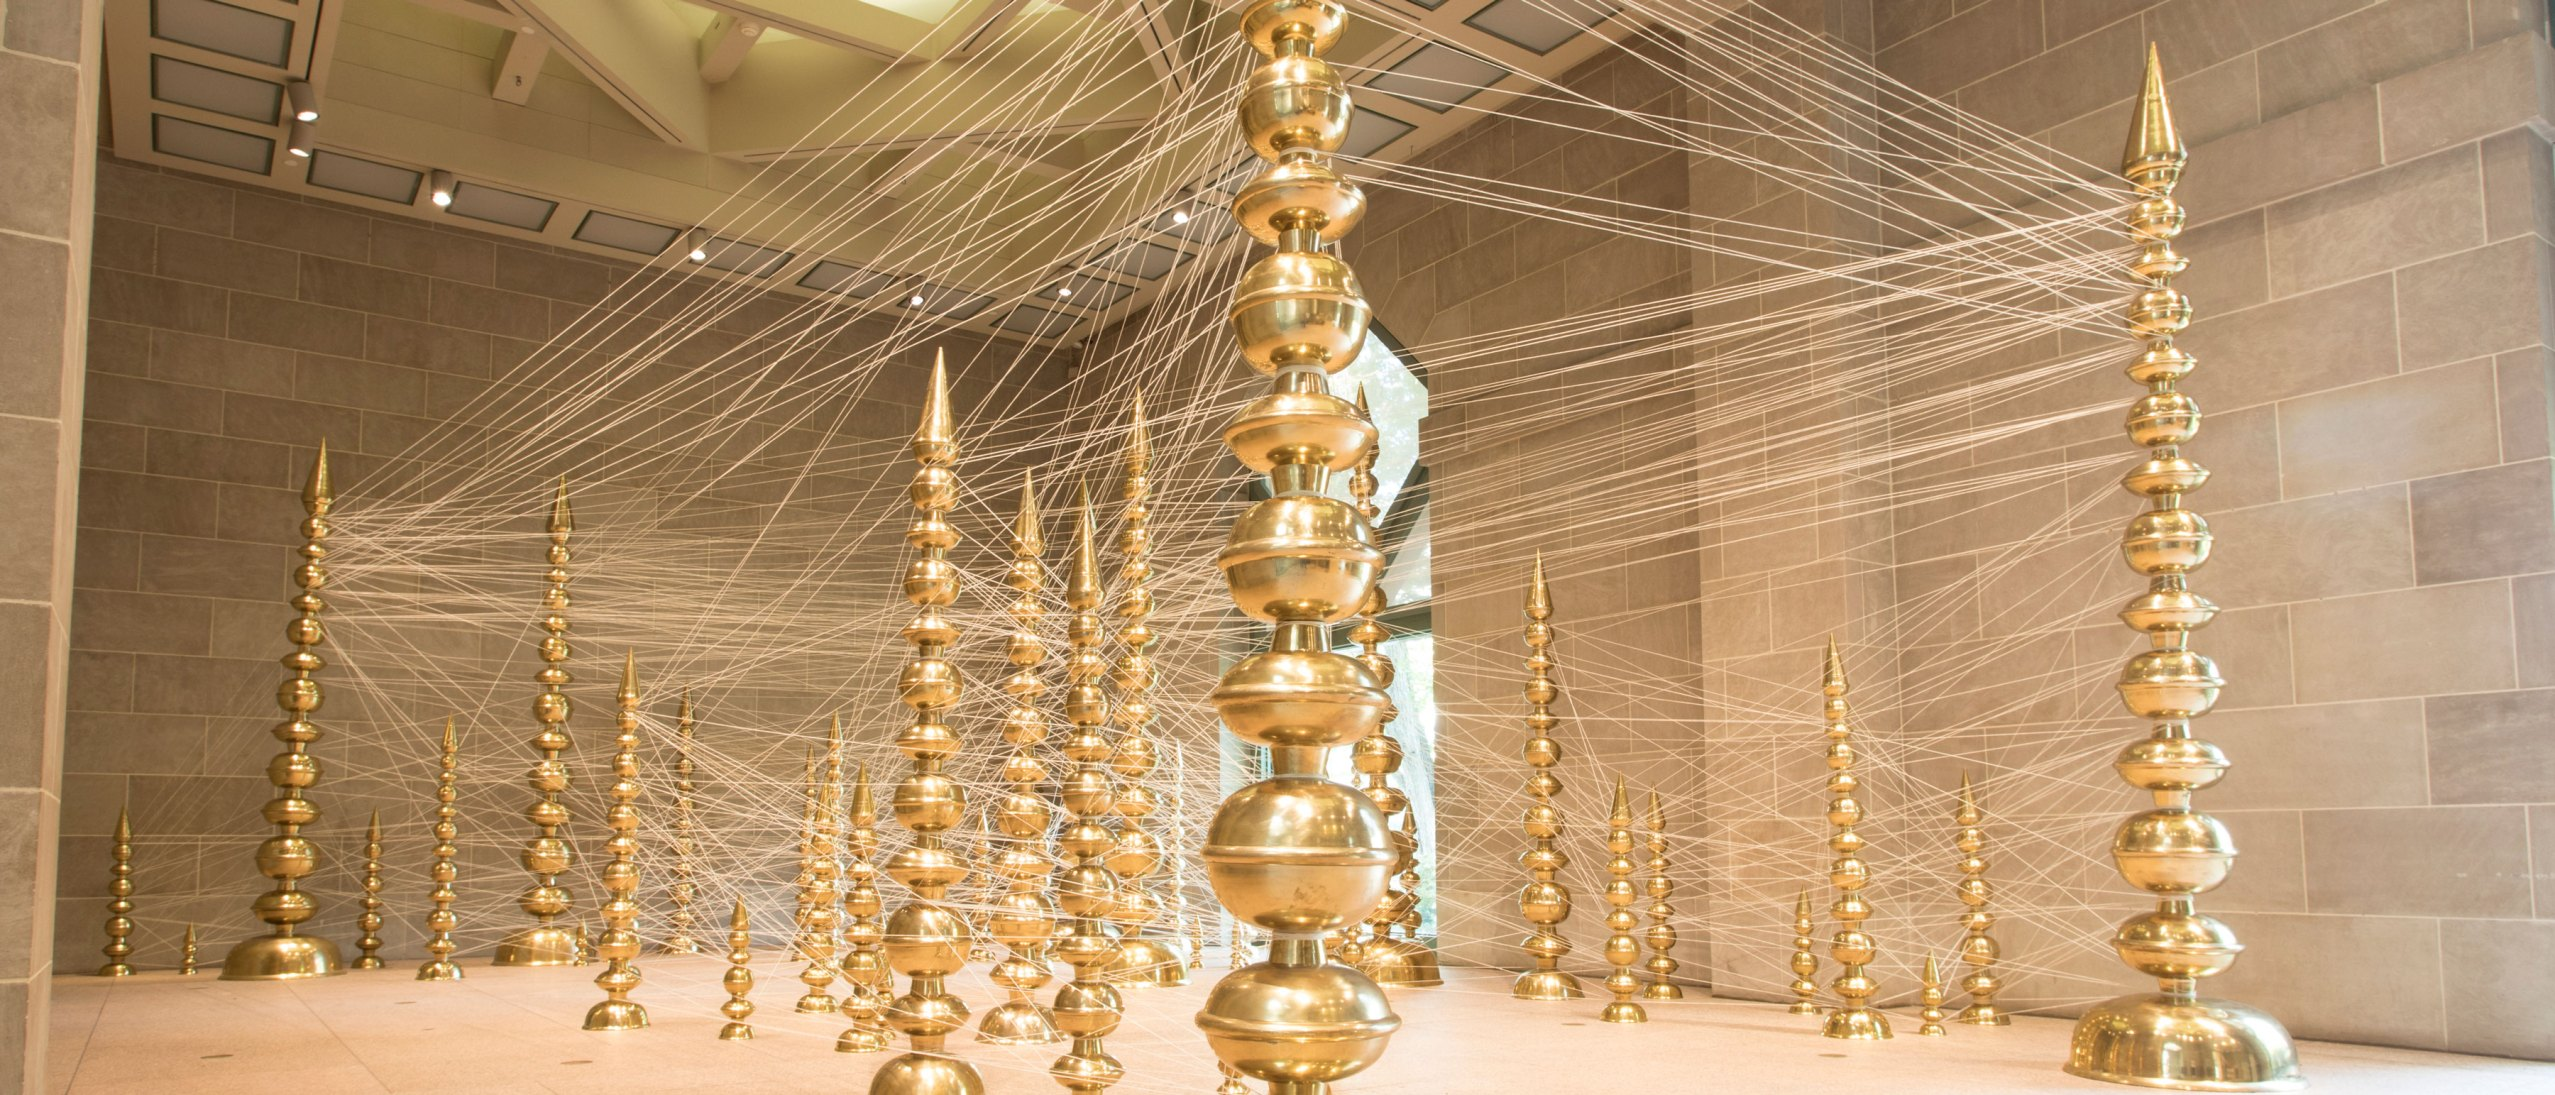 Subodh Gupta: Terminal as installed in the Sackler gallery pavillion